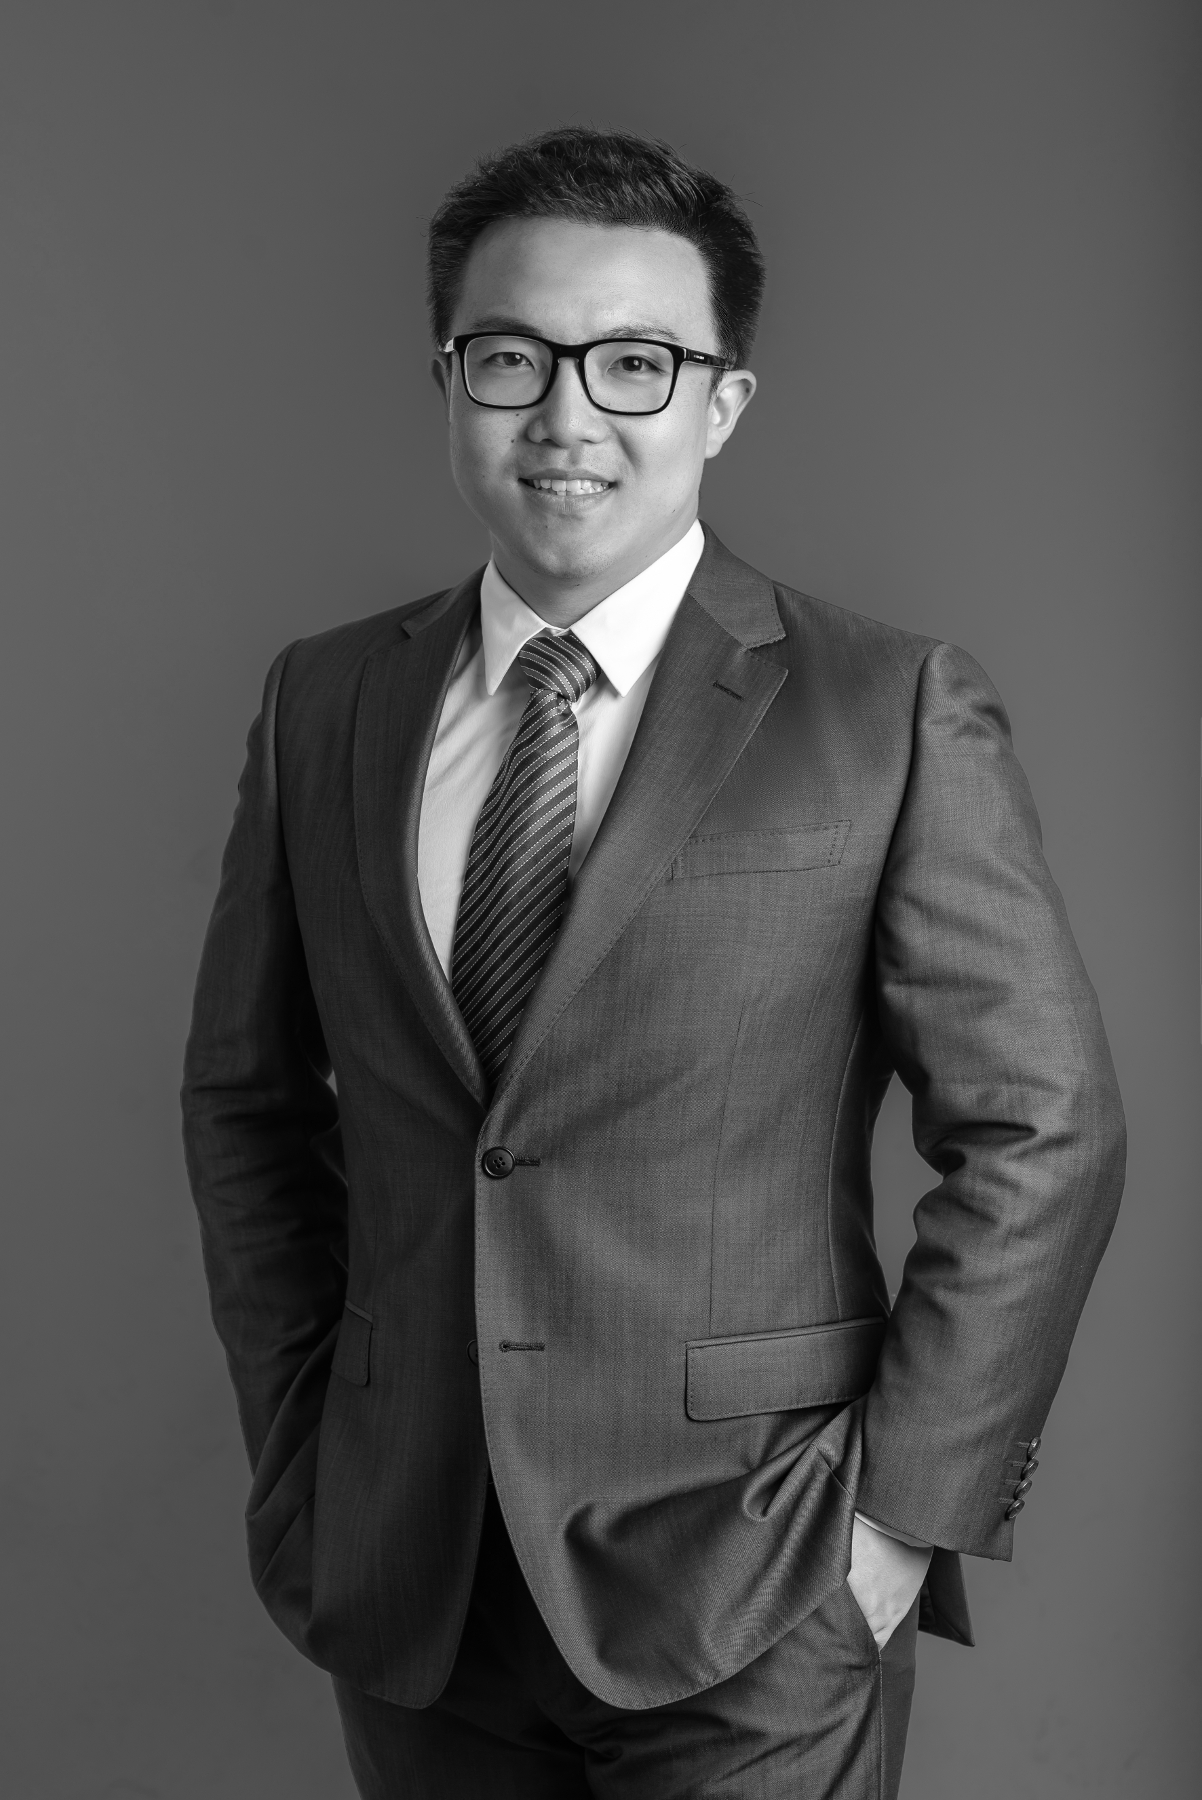 James Jiang